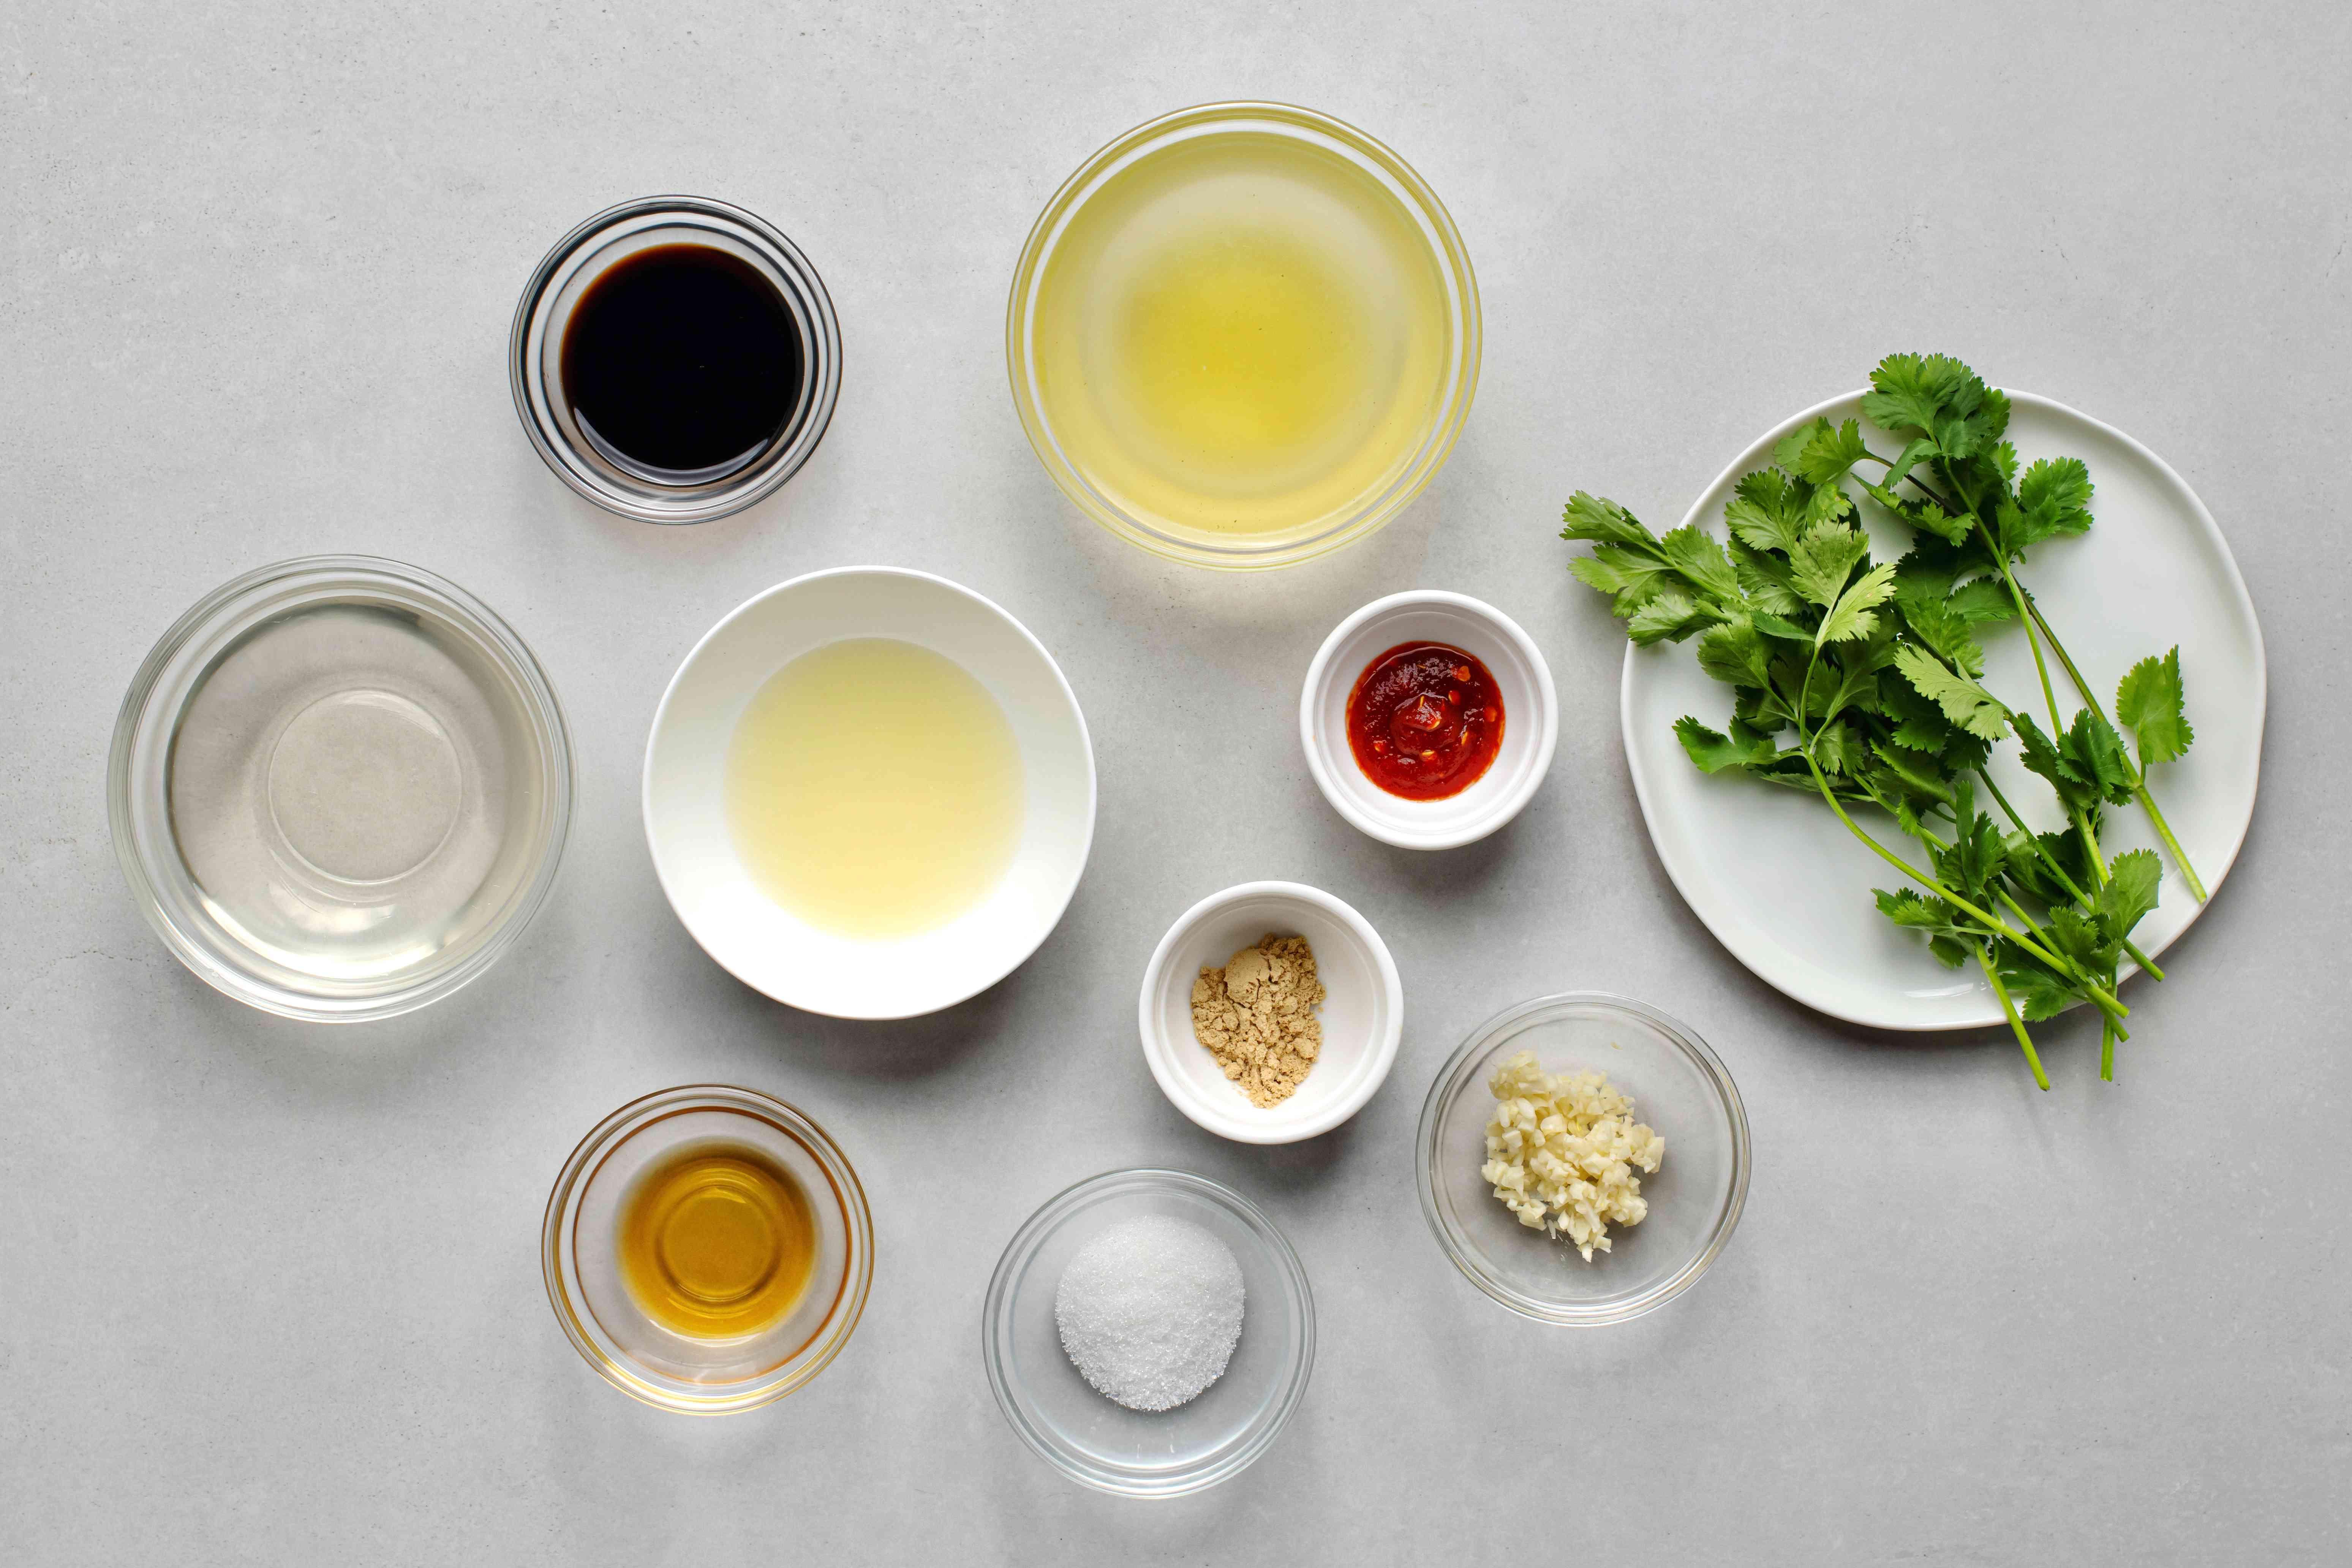 Low Calorie Asian Salad Dressing ingredients